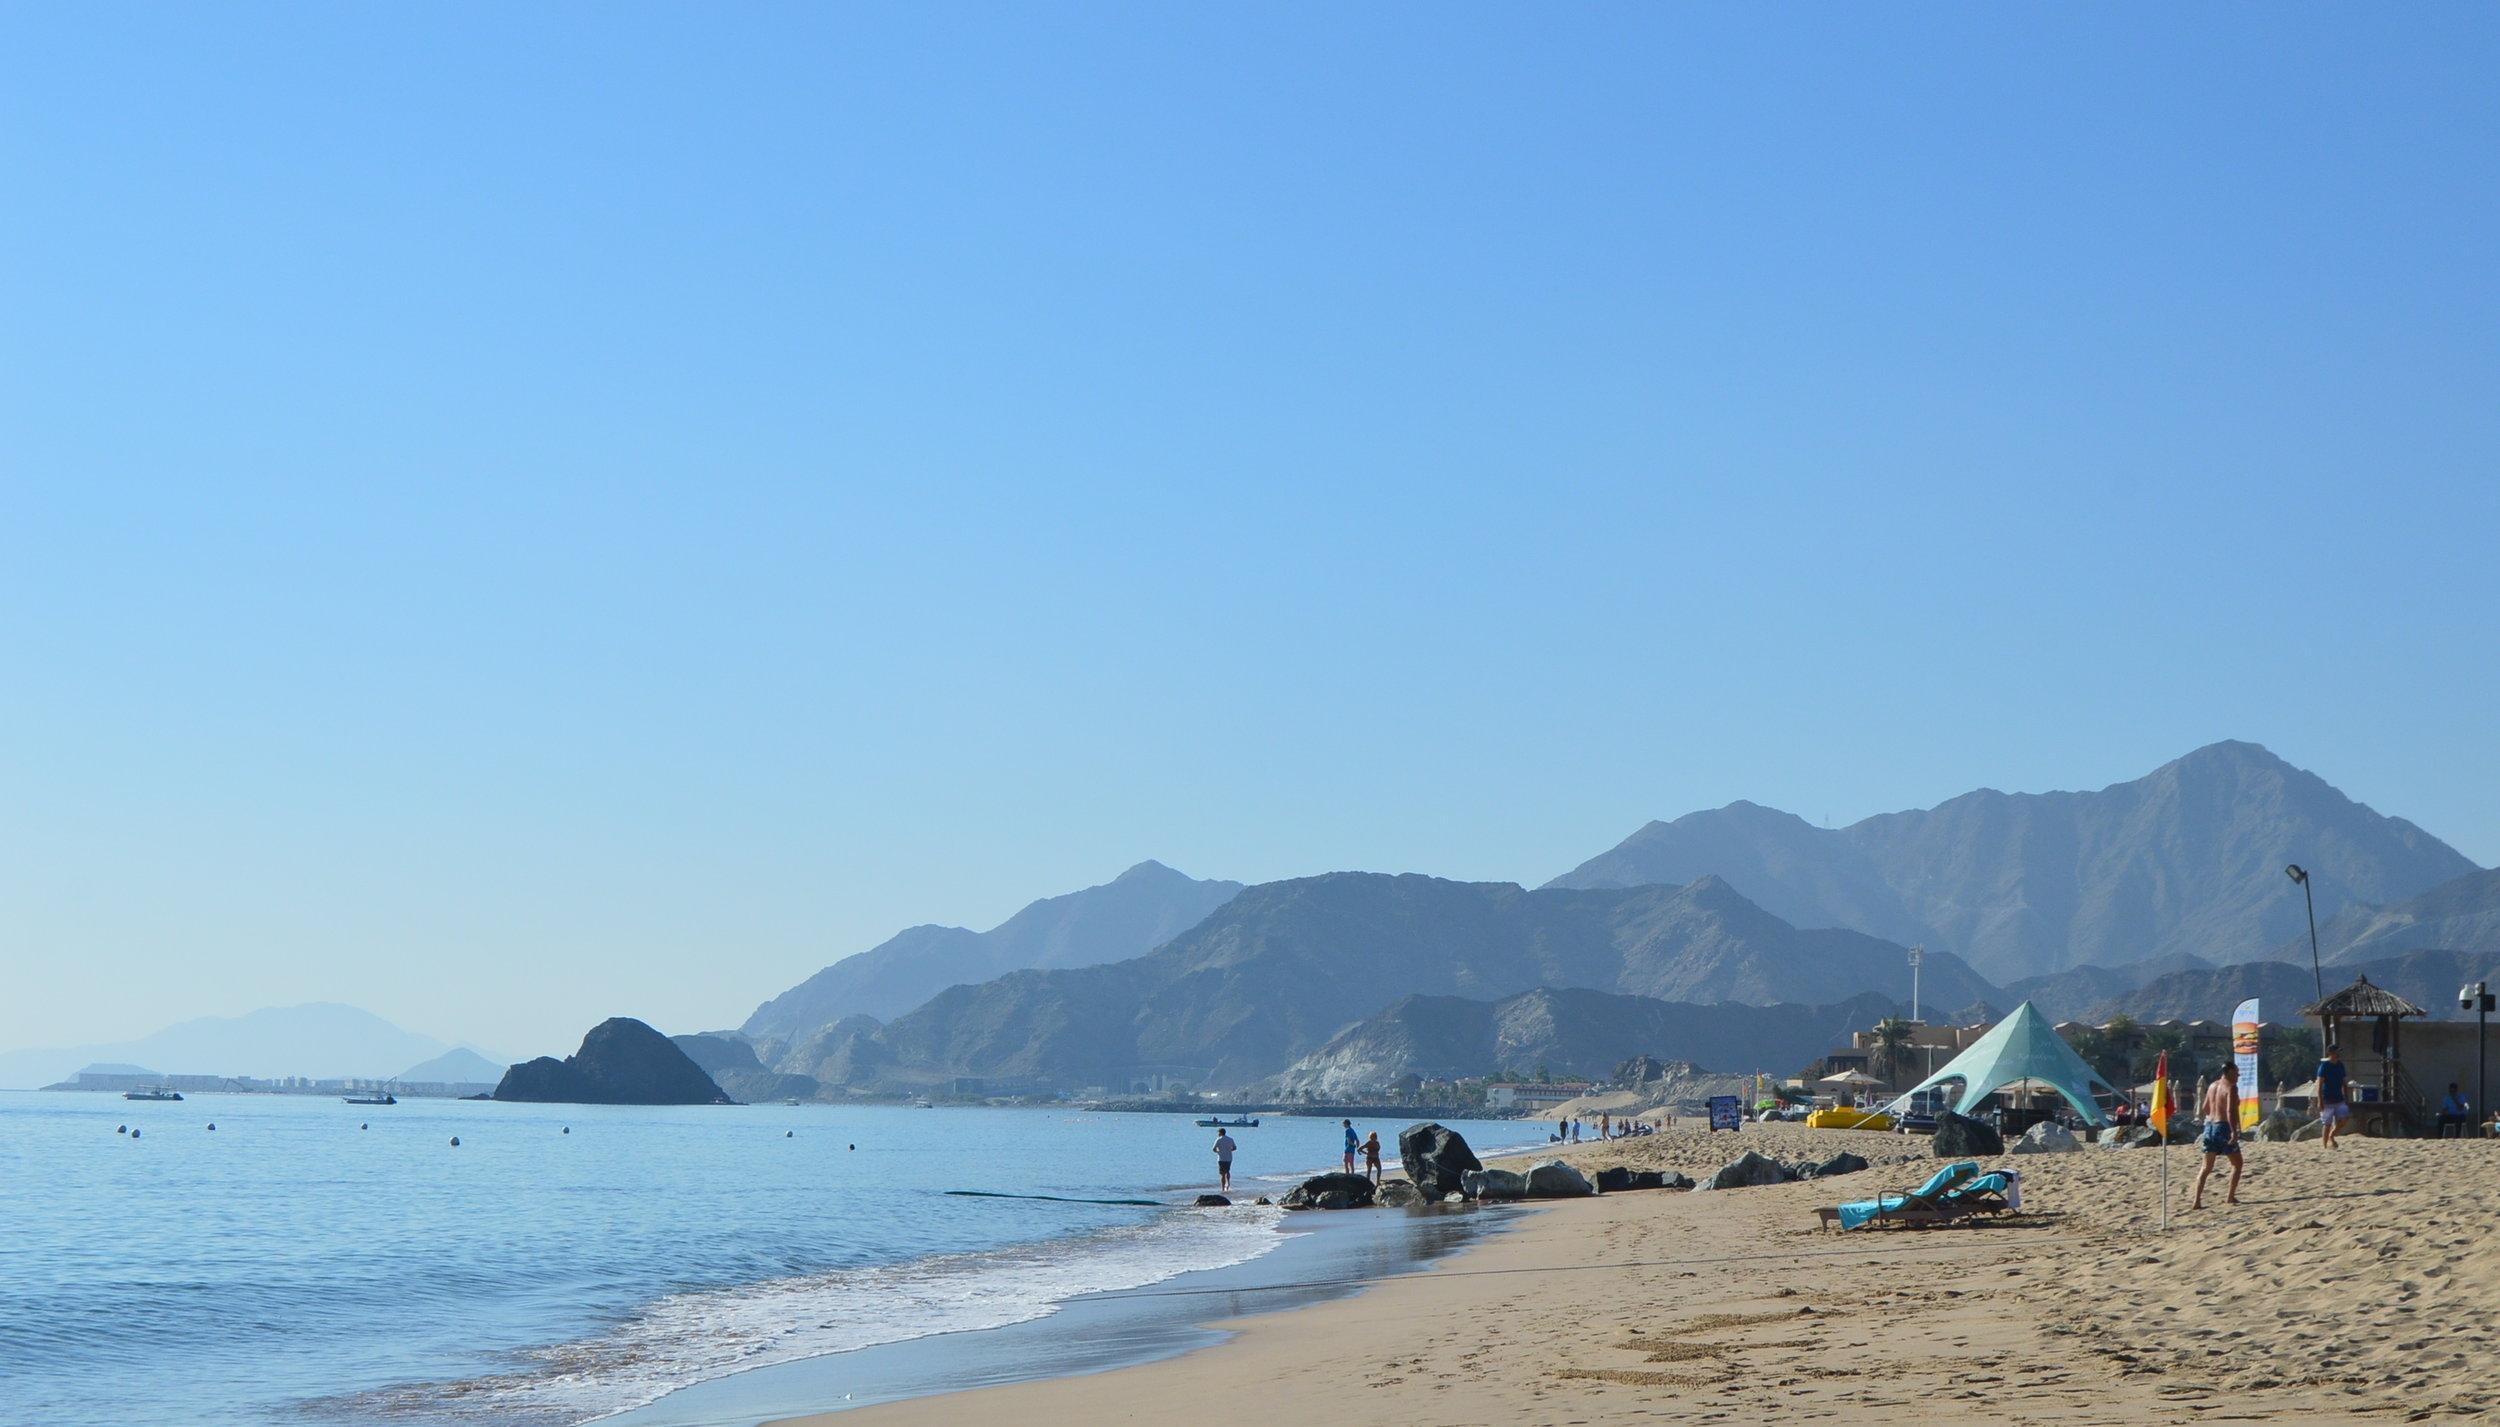 1st stop on Day 3 - January 2, 2018: Le Meridien, Al Aqah Beach Resort